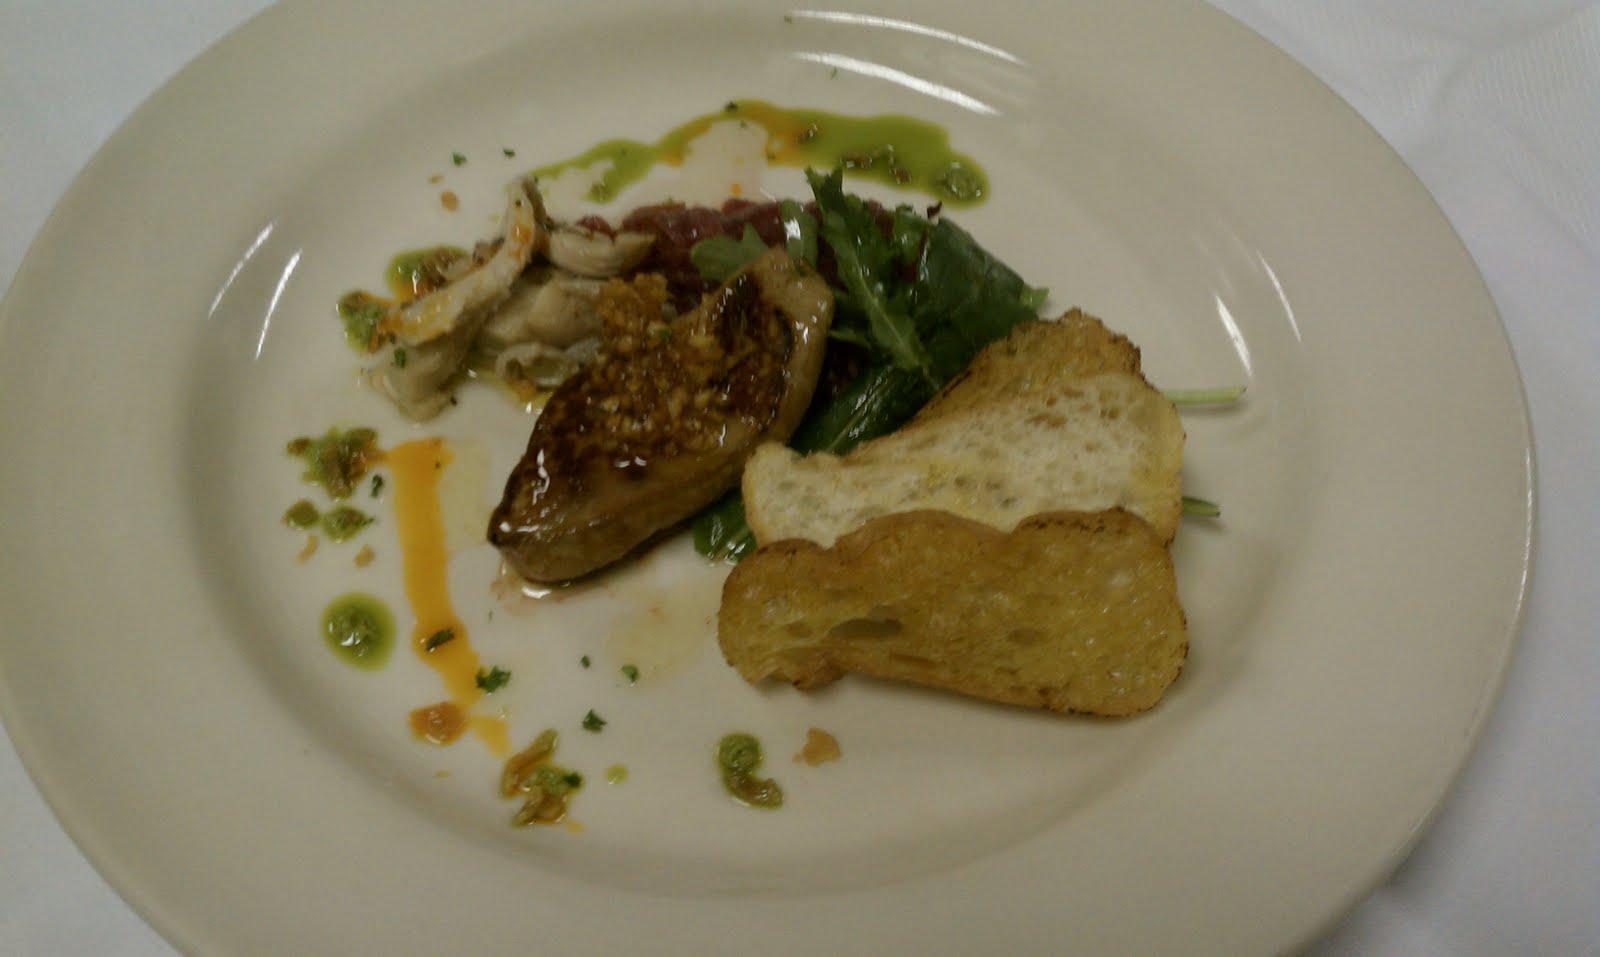 Seared foie gras, brioche, red onion jam, pickled oyster mushroom ...